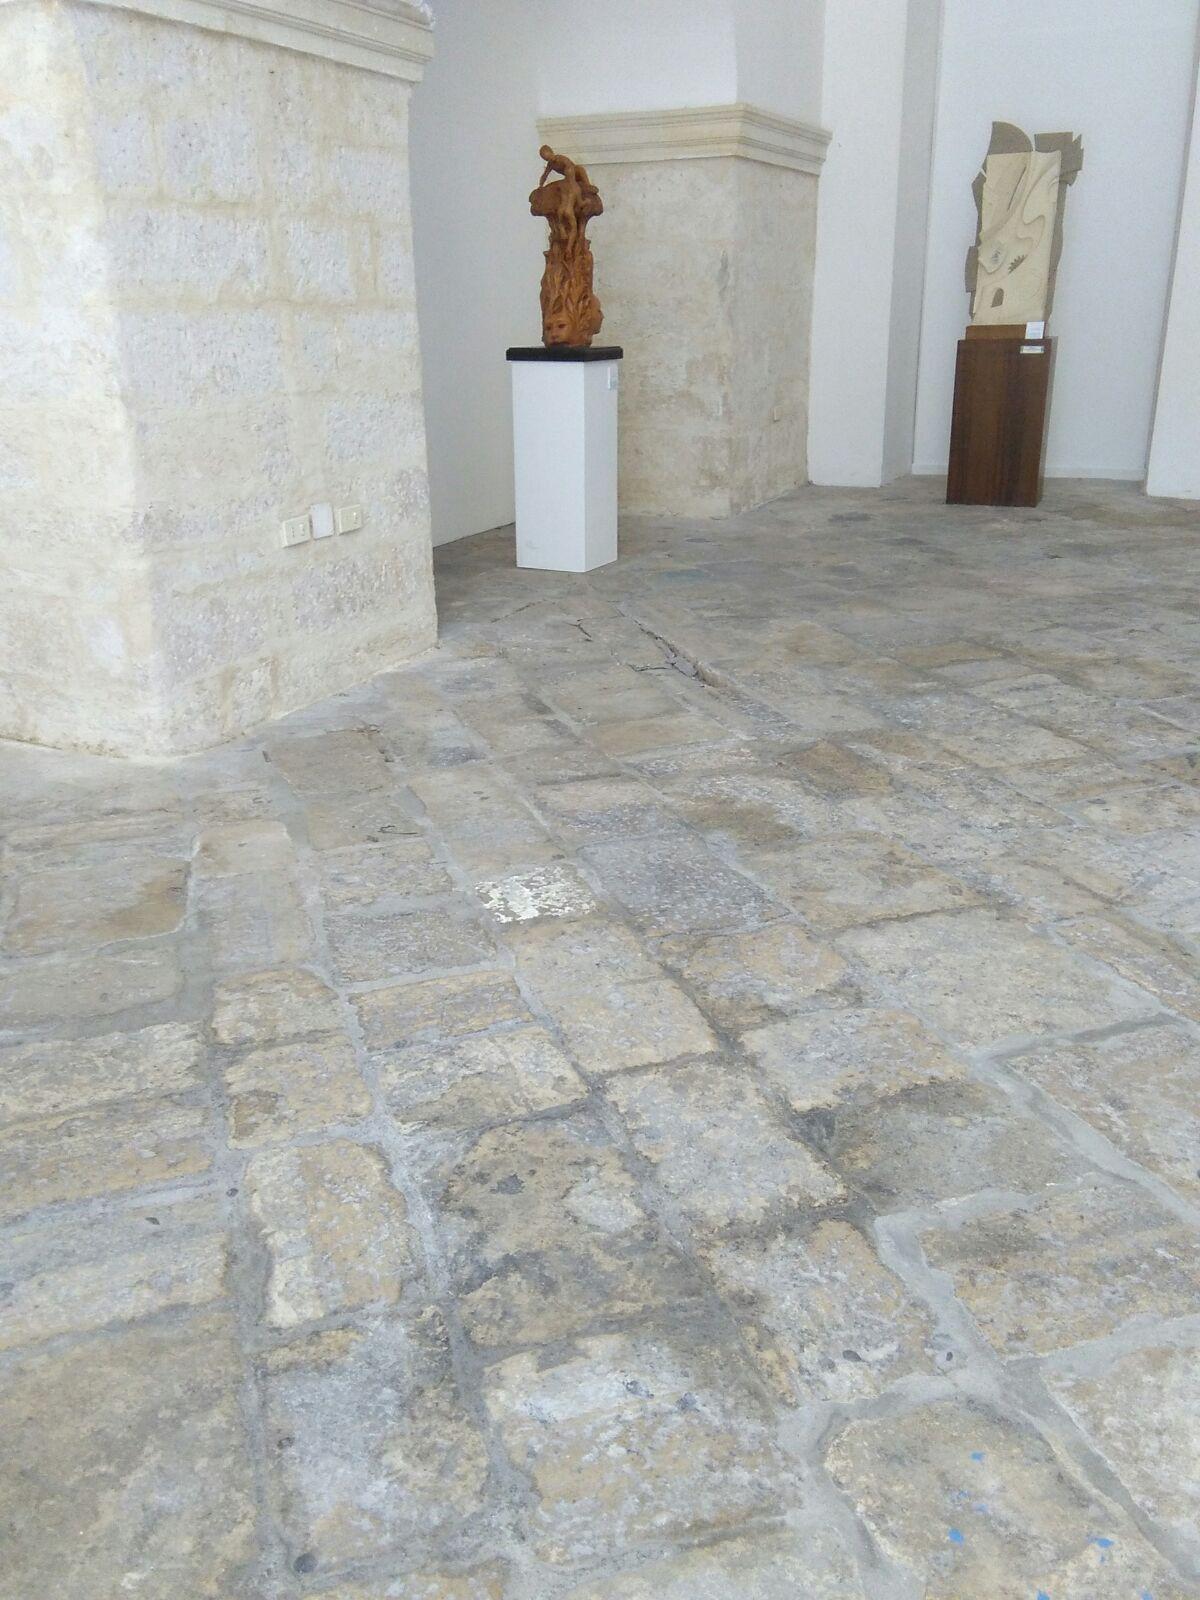 cedimento pavimento sala mostre  5